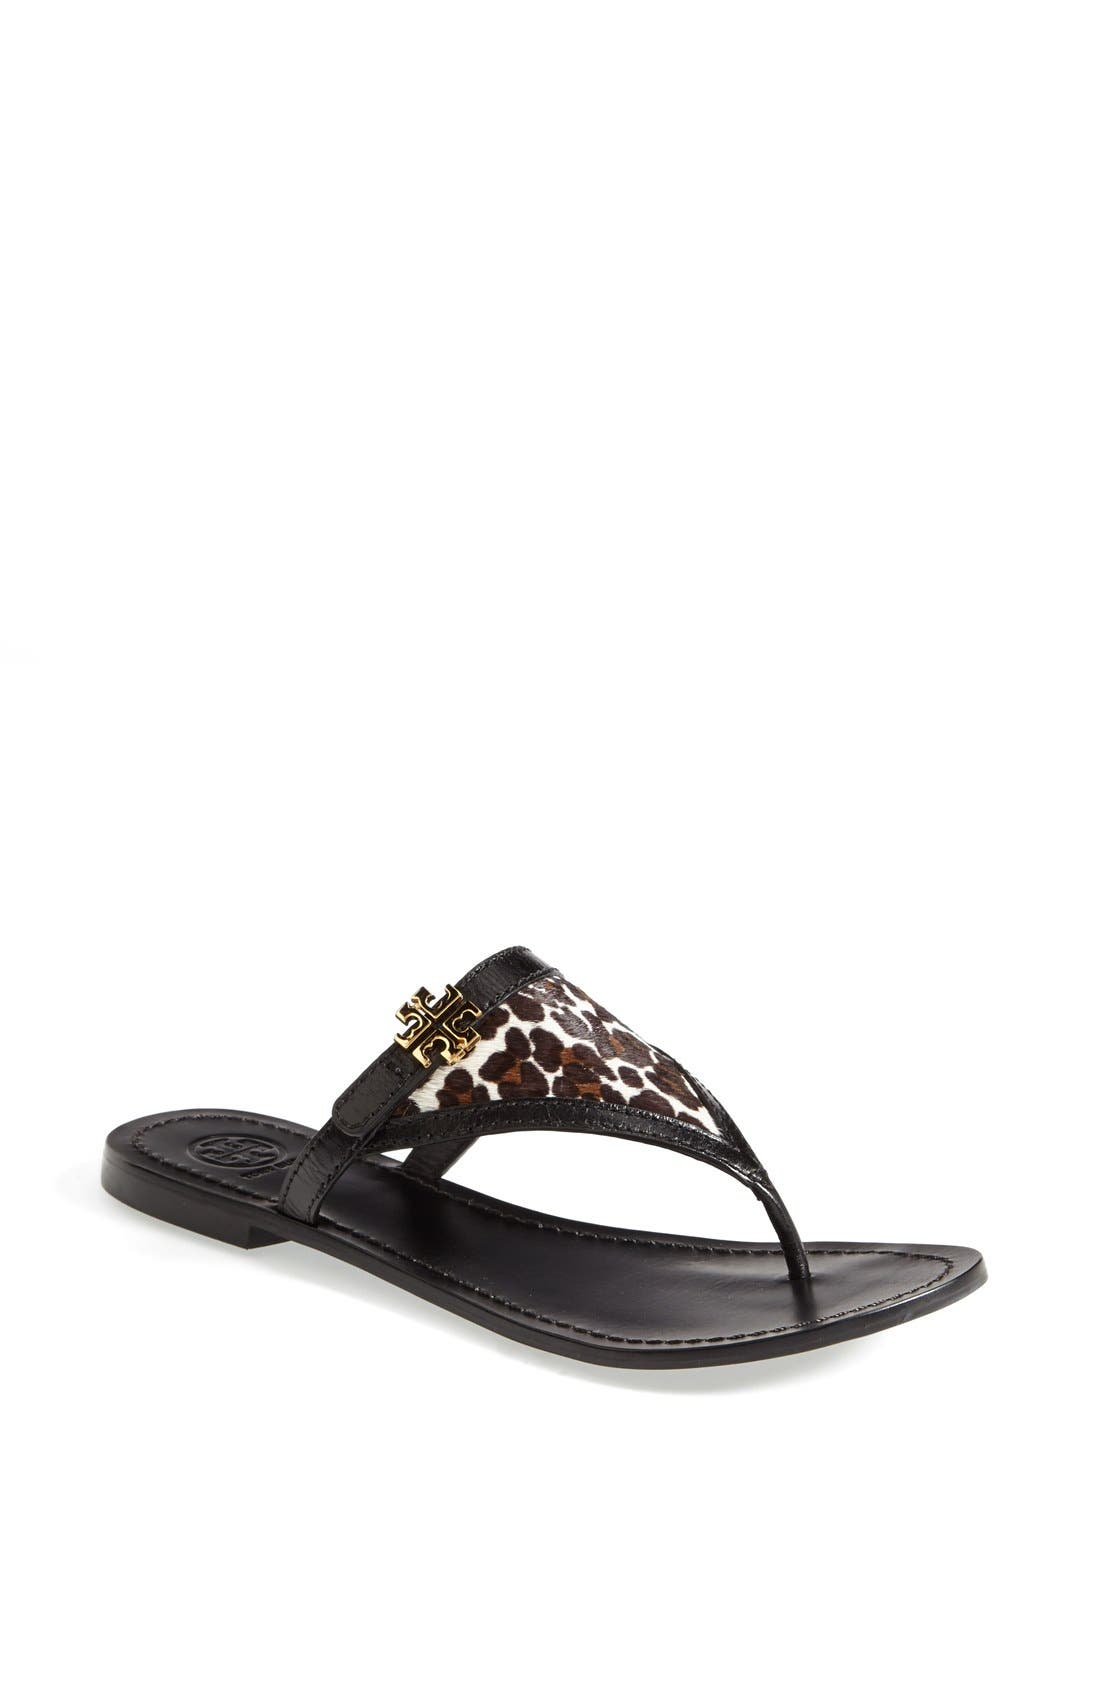 Main Image - Tory Burch 'Eloise' Flat Thong Sandal (Nordstrom Exclusive) (Women)